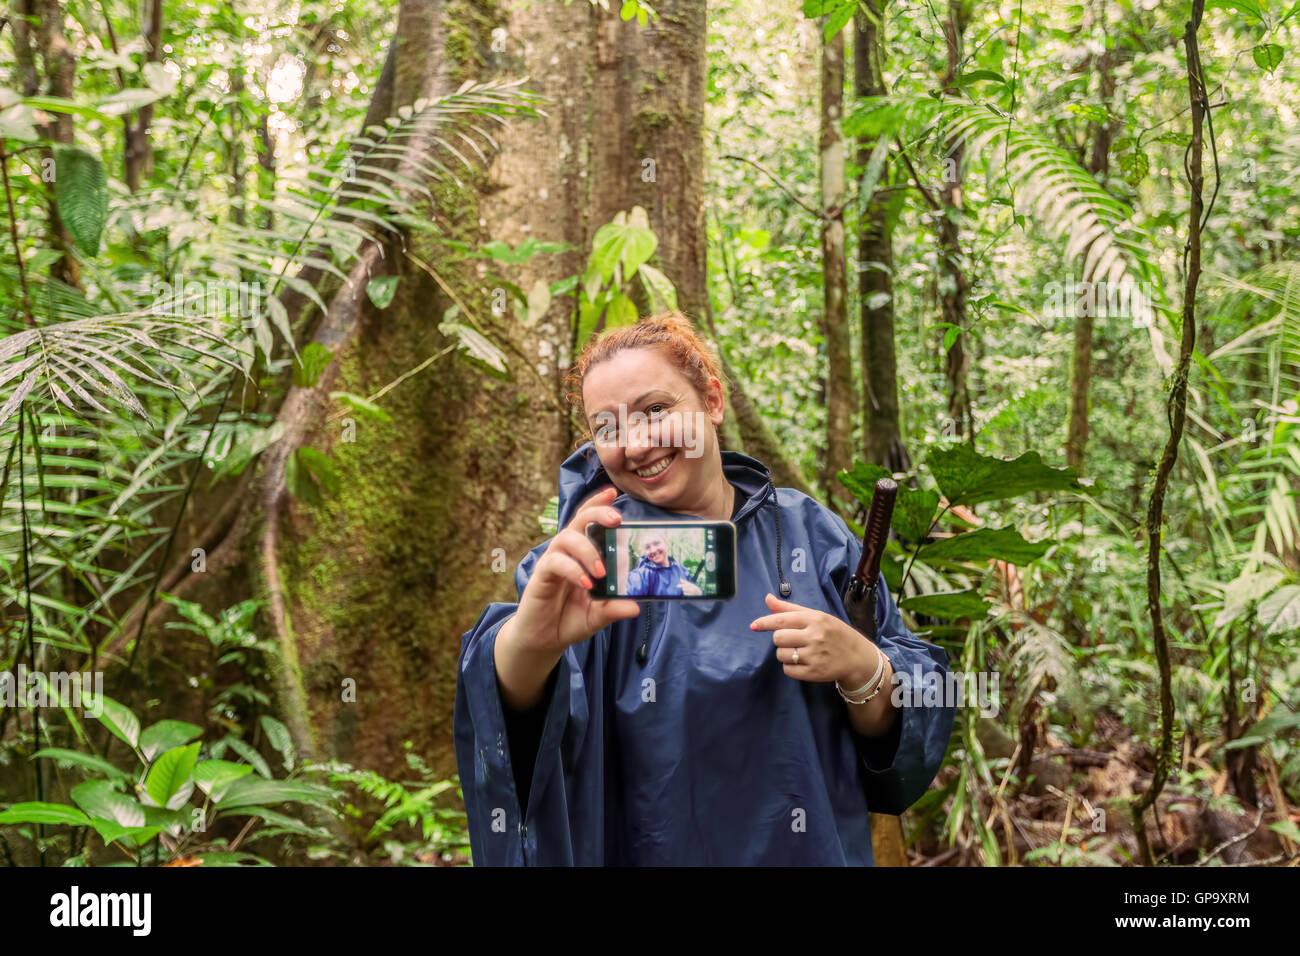 European Blonde Woman Exploring The Jungle Swamp In Cuyabeno National Park, South America - Stock Image